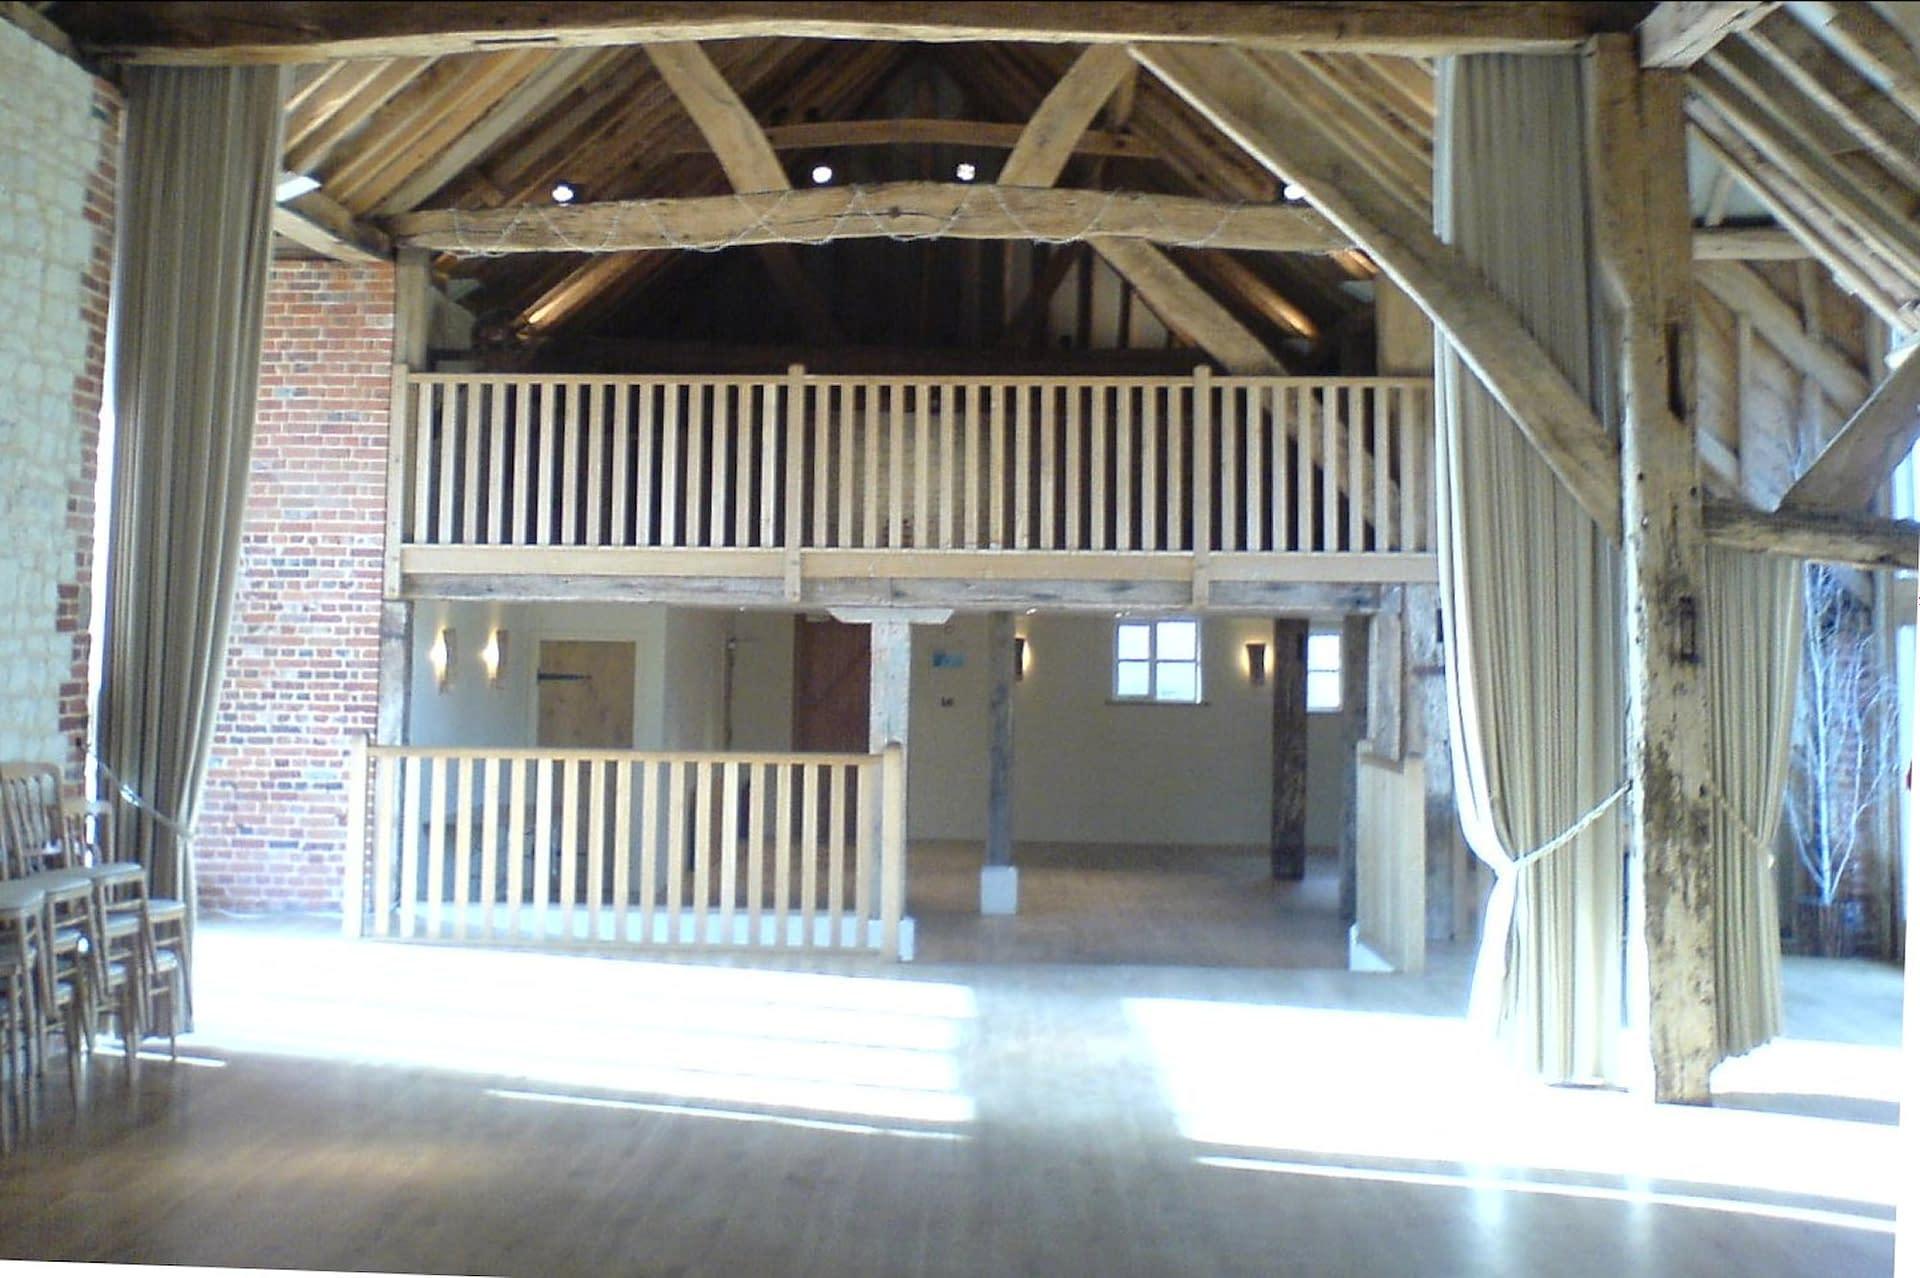 An un-decorated Bury Court Barn UK wedding venue awaiting party decorators